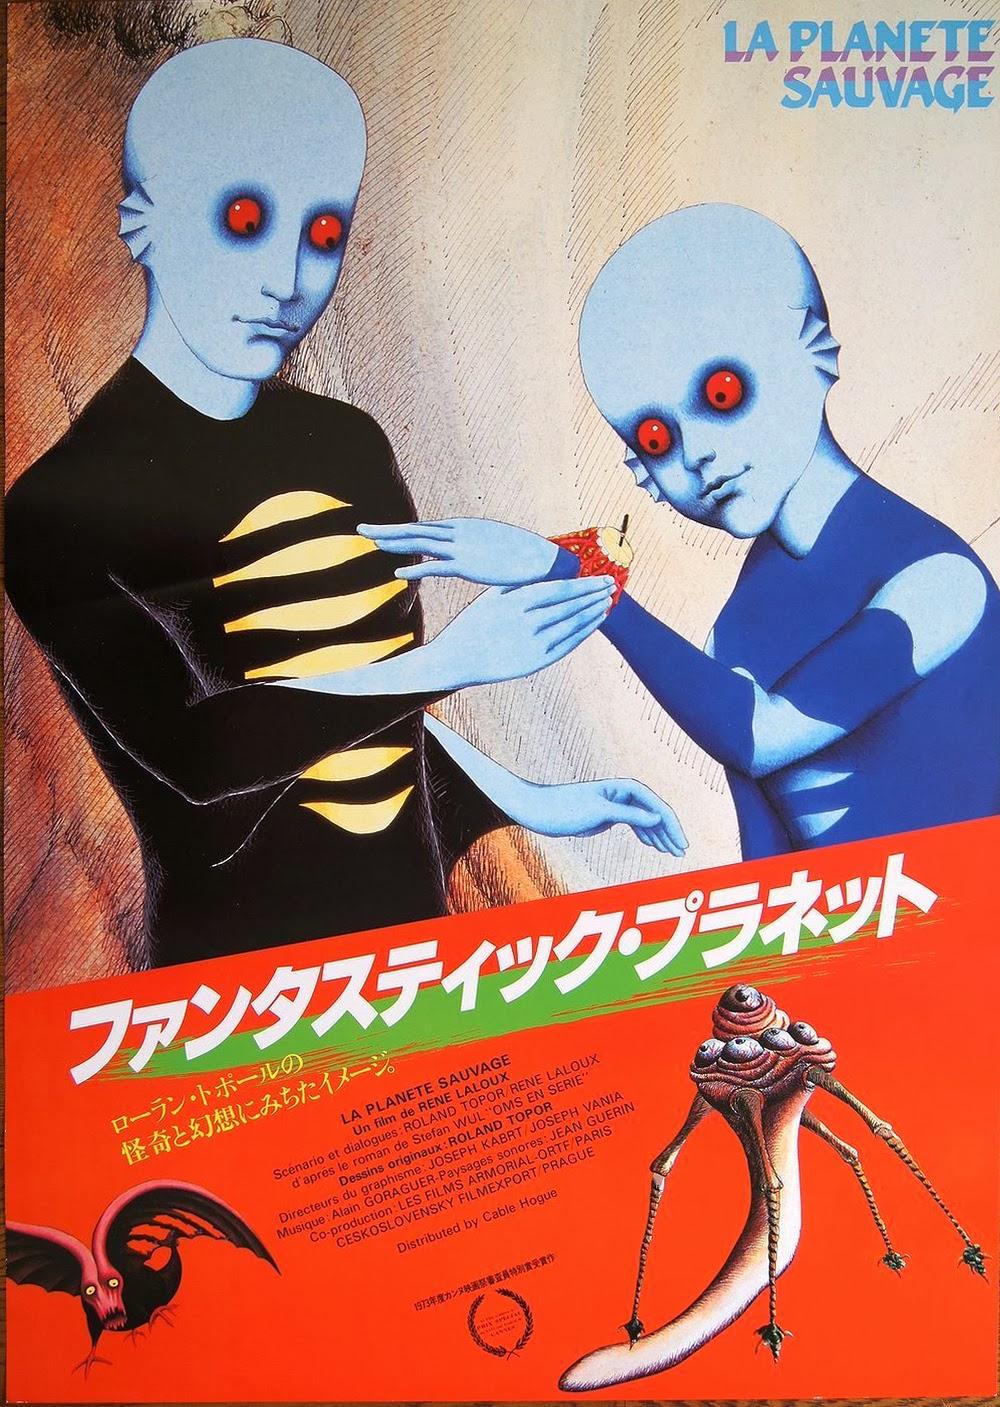 http://4.bp.blogspot.com/-WQJf2k6mrhU/Utsfr1kMnpI/AAAAAAAAG-A/D8DB52N3DtM/s1600/FANTASTIC+PLANET+-+Japanese+Poster.JPG